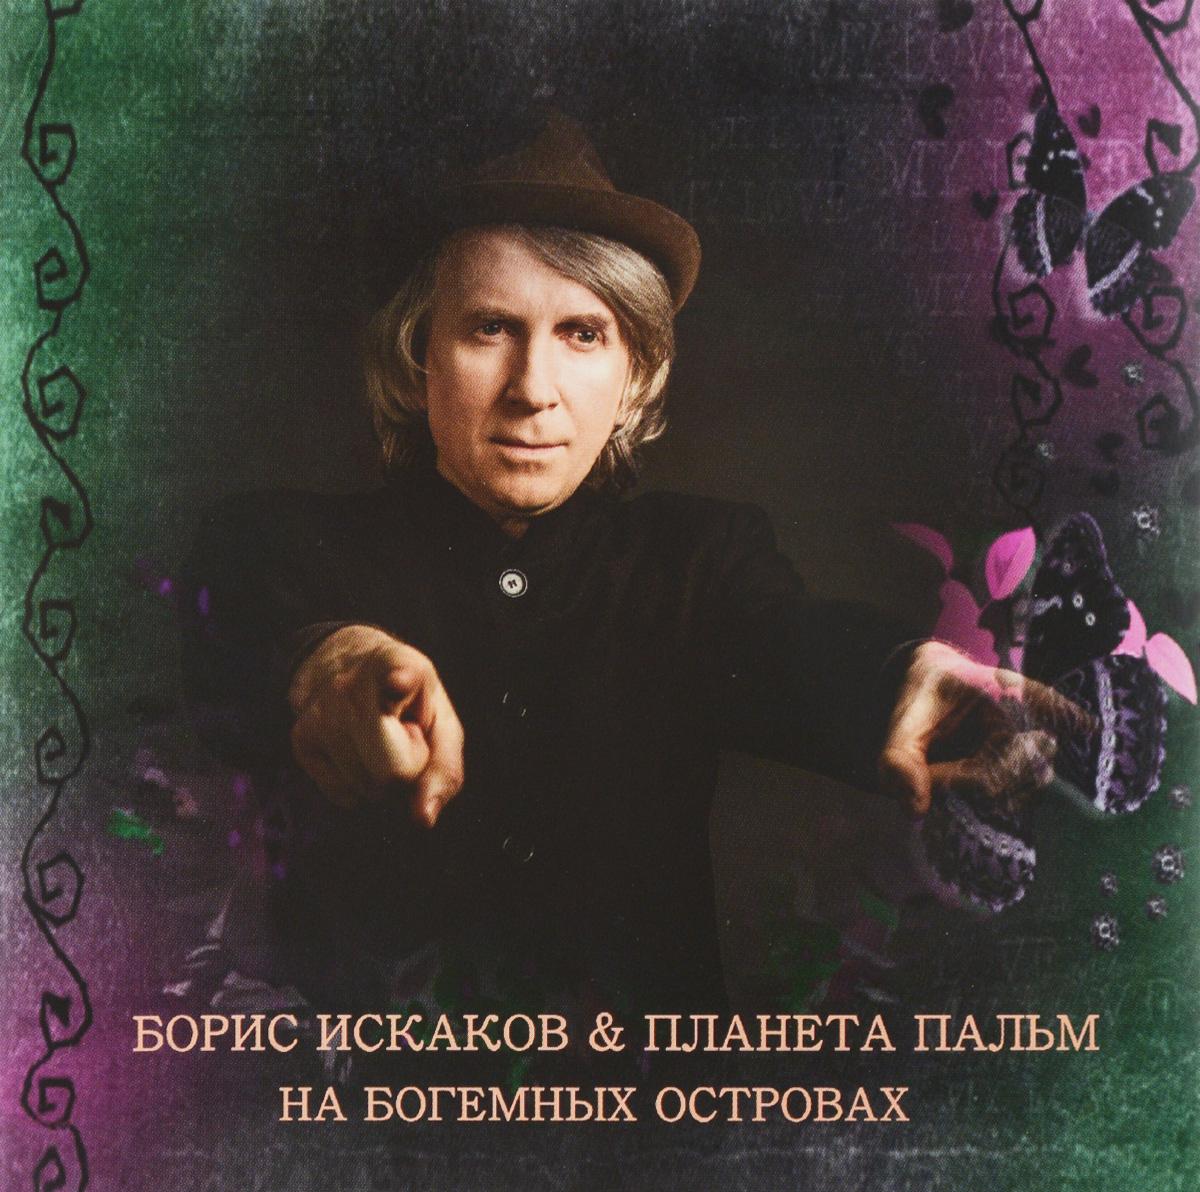 Борис Искаков &amp